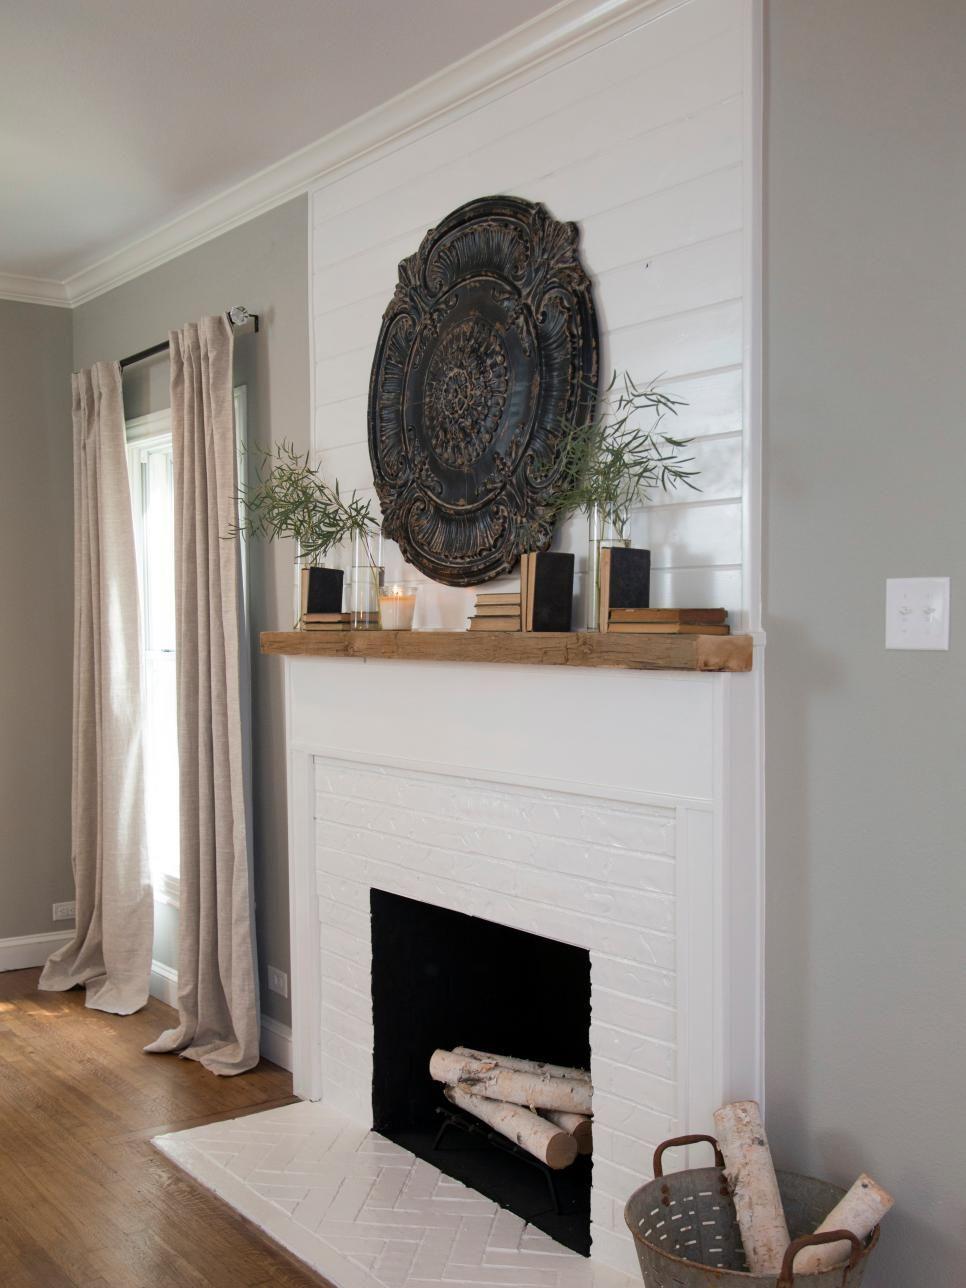 Get Inspired The Diy White Brick Fireplace White Brick Fireplace Painted Brick Fireplaces Country Living Room Design